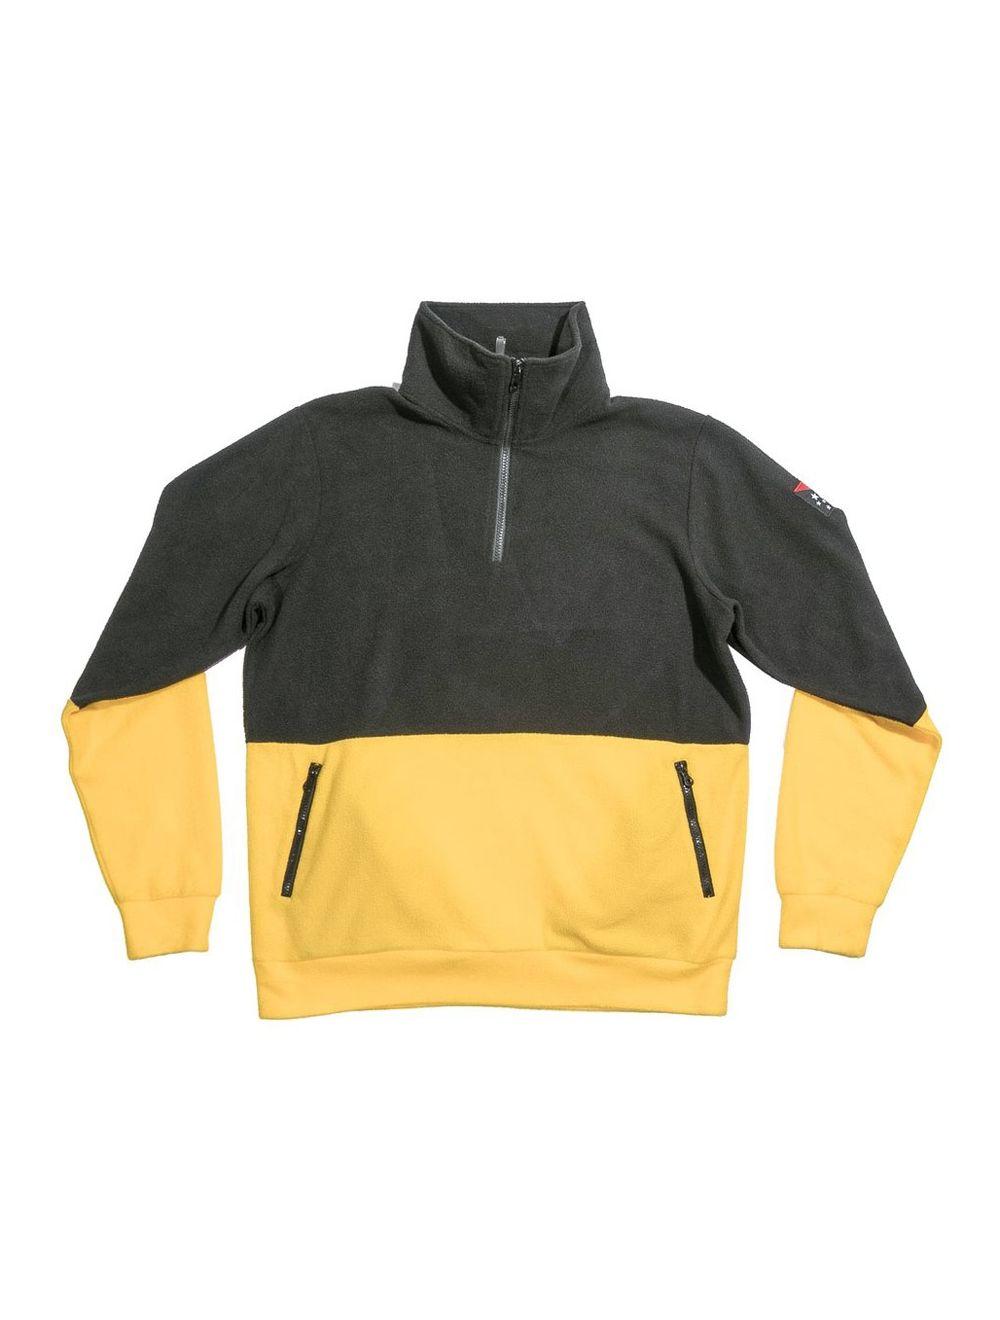 buy popular 2d0e7 bb0ce Grizzly x Black Scale Half Zip Pullover - Gunmetal